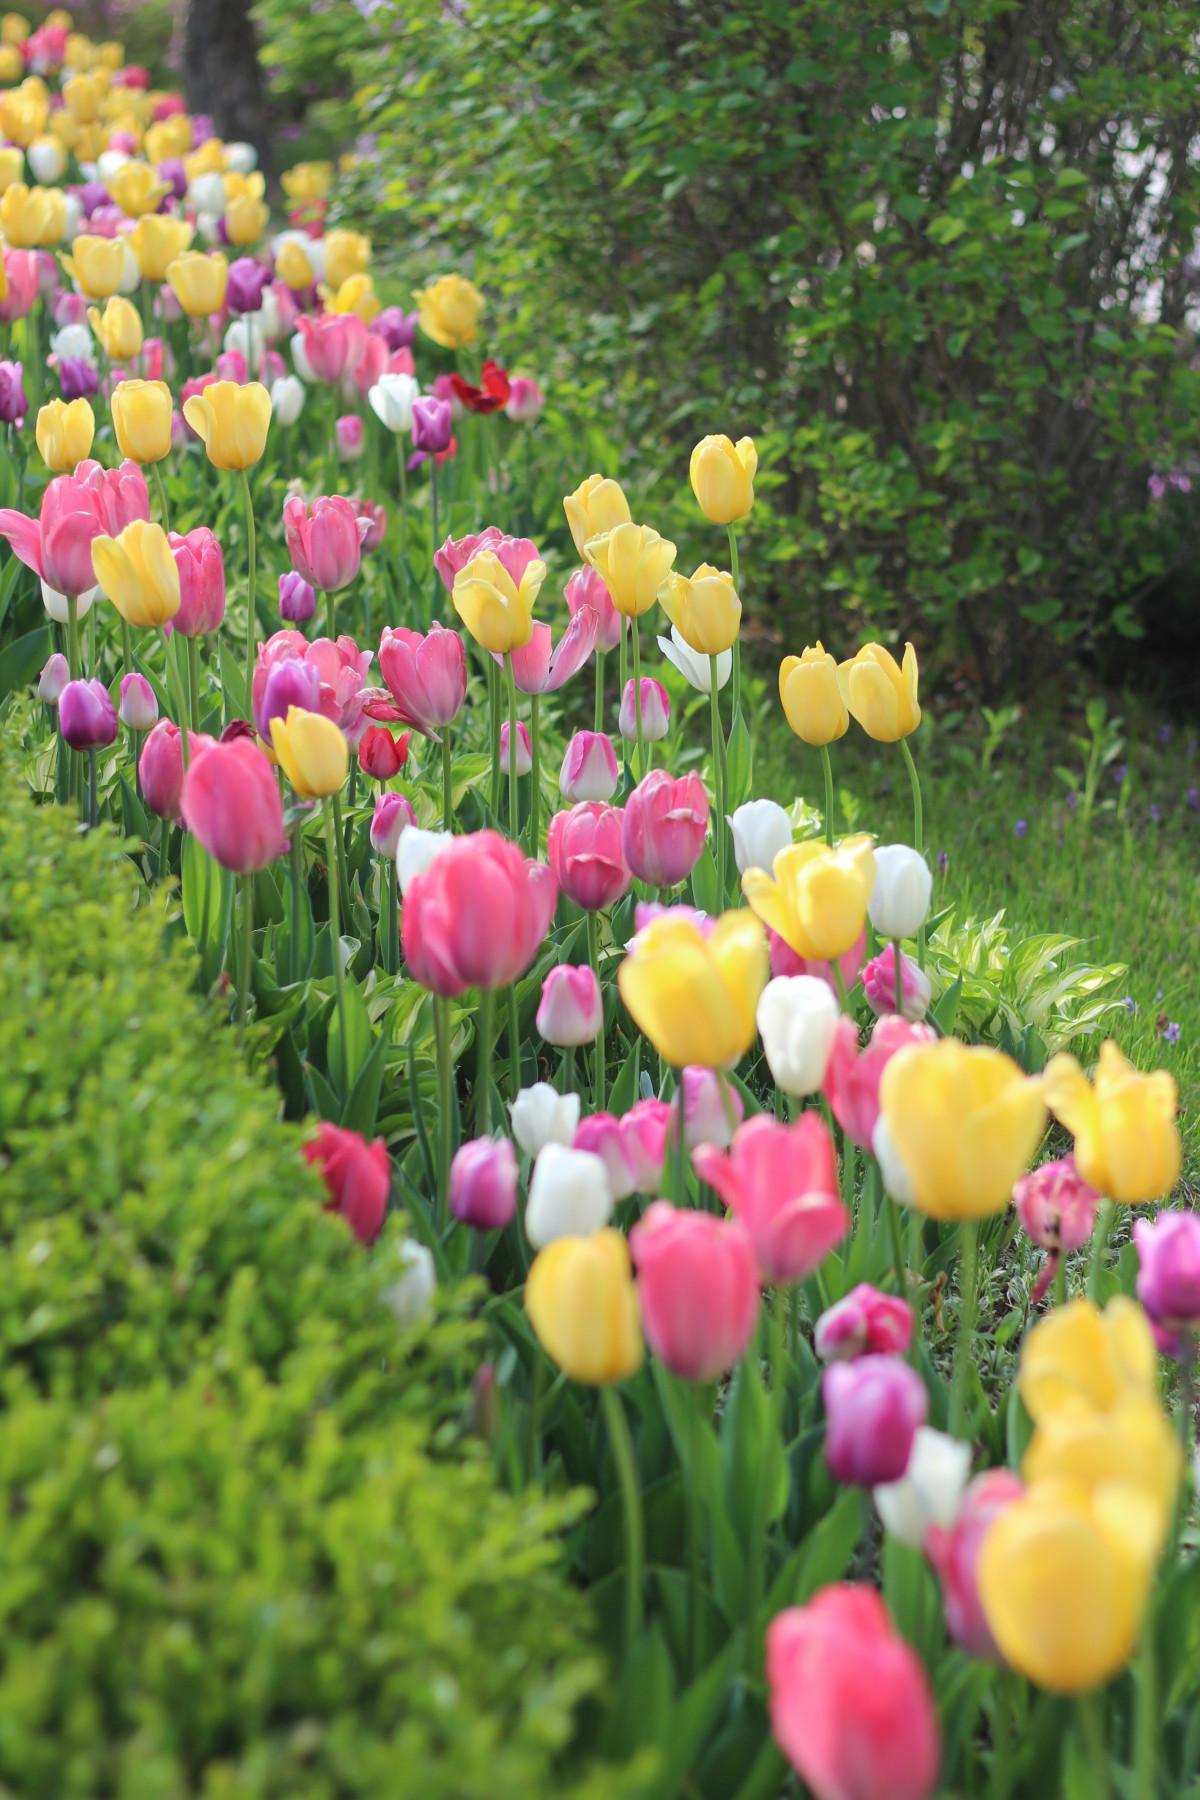 kostenlose foto : natur, feld, wiese, blume, blütenblatt, tulpe